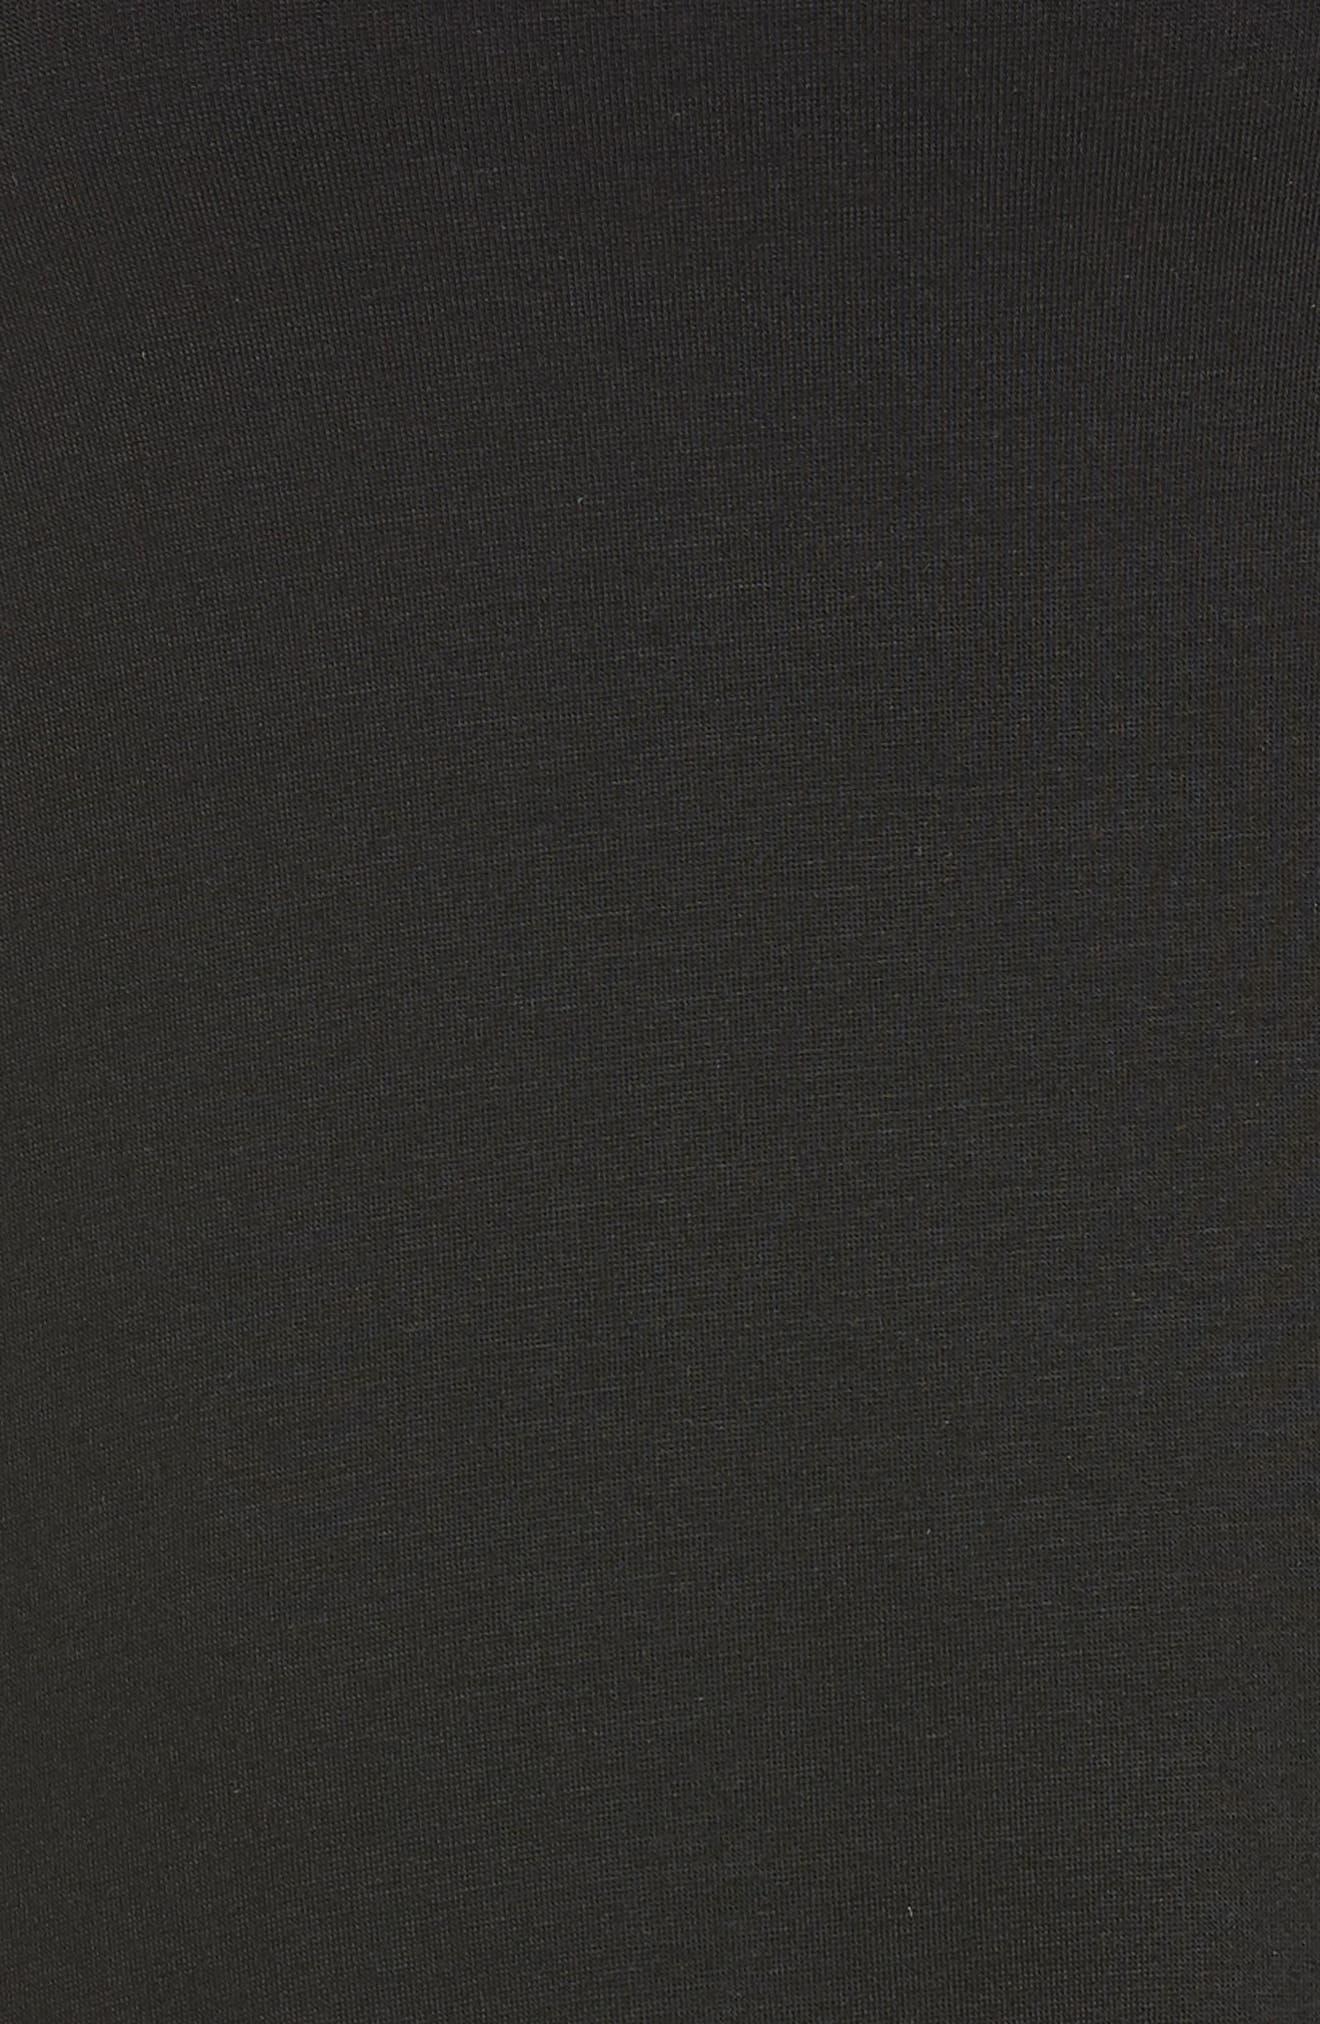 Slink It Boxy Pullover,                             Alternate thumbnail 6, color,                             BLACK